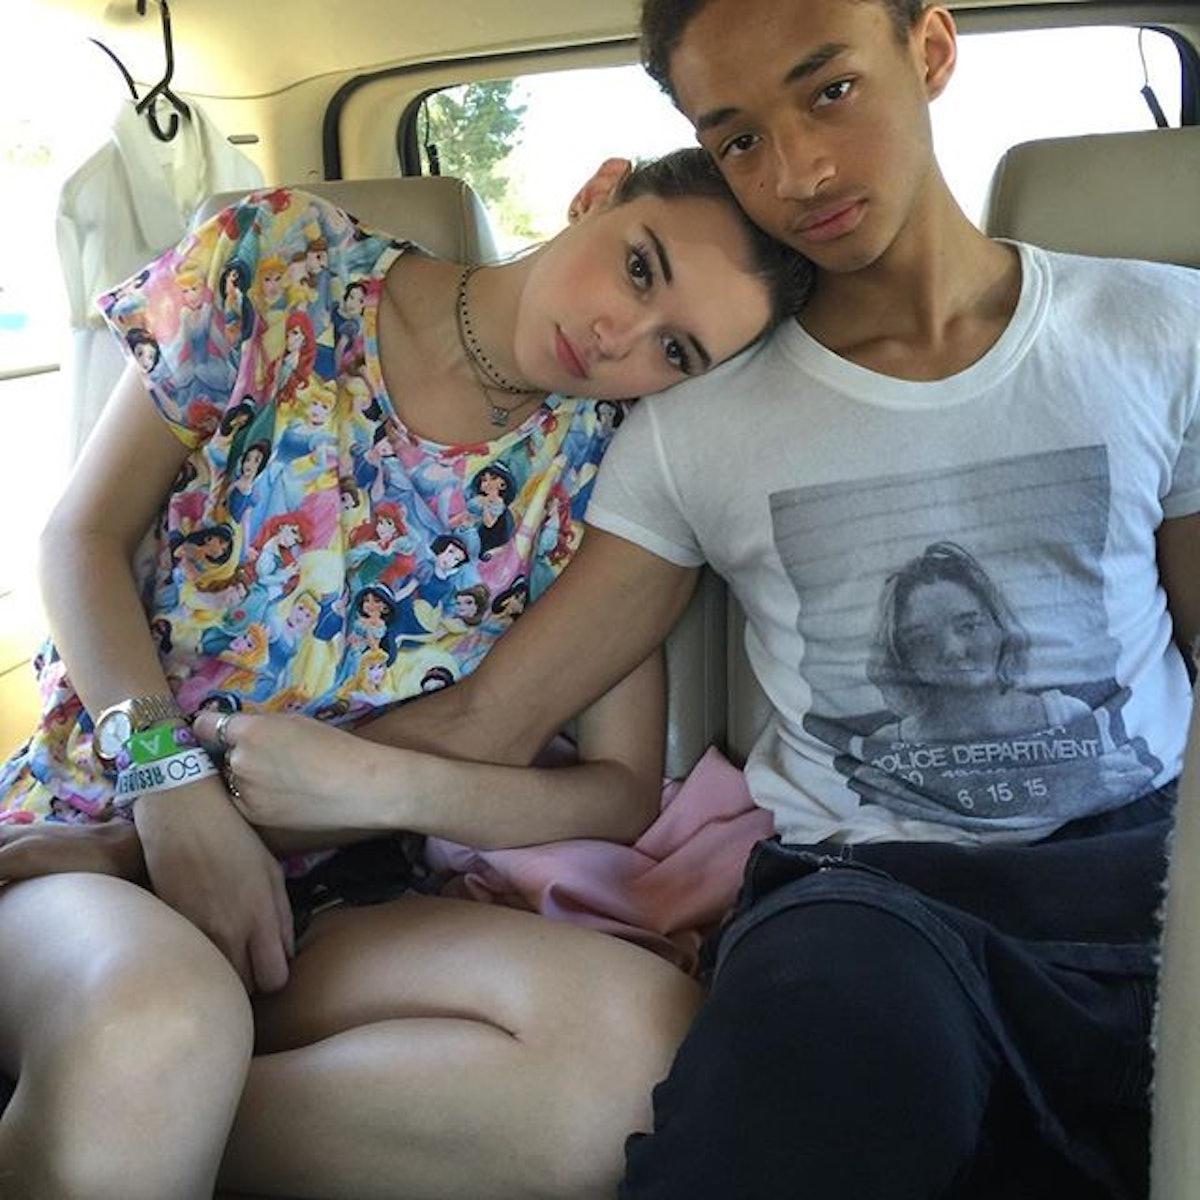 Sarah Snyder and Jaden Smith